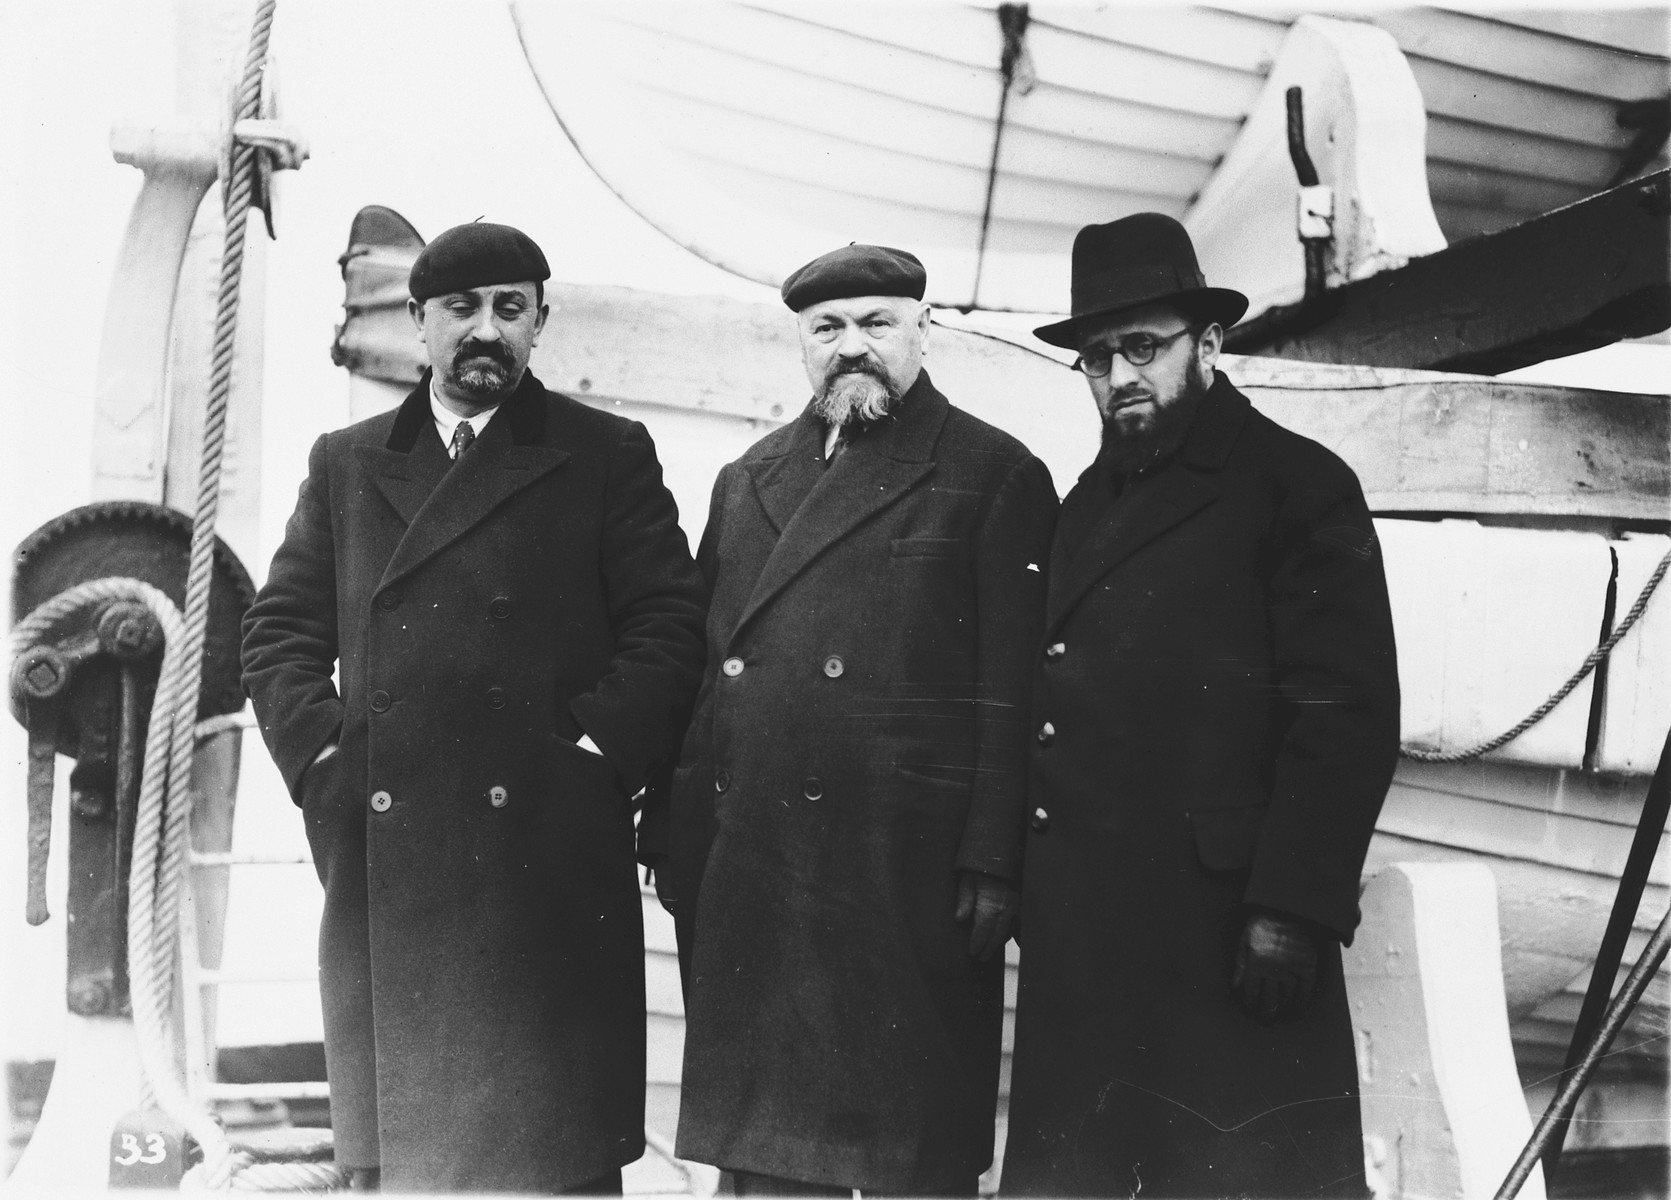 Shlomo Zalman Shragai, a leader of the Poel Hamizrachi and the Jewish Agency, arrives in New York harbor accompanied by Meyer Berlin.